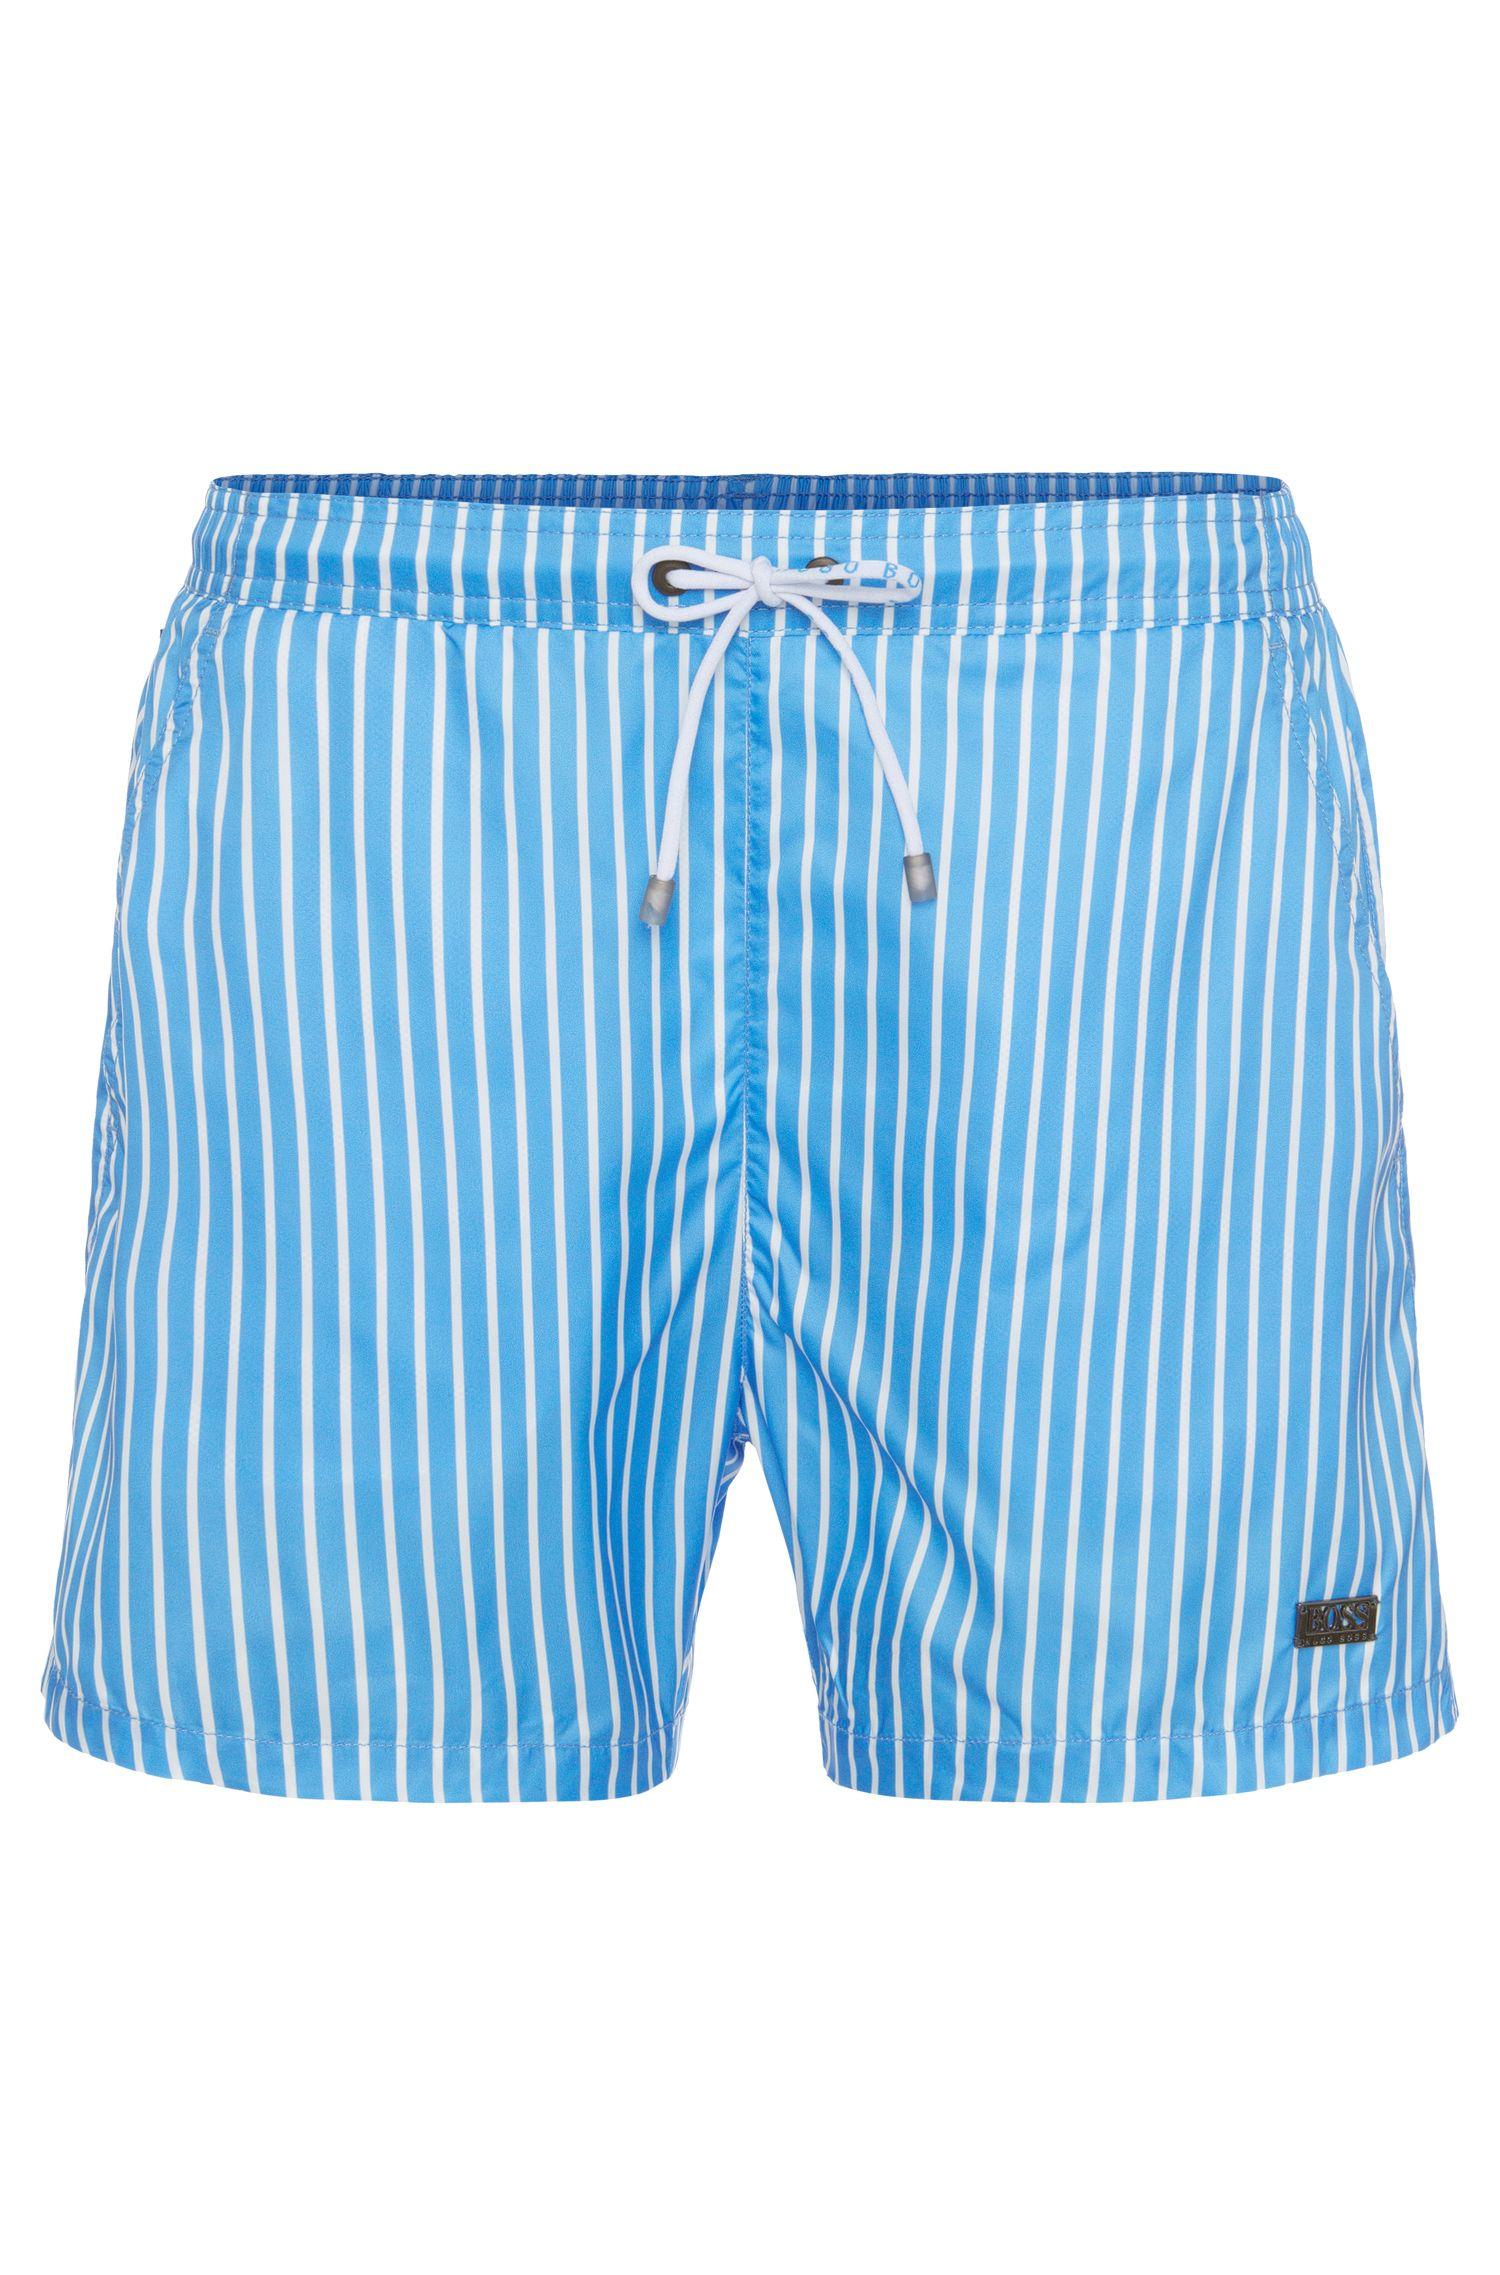 Striped Swim Trunks | Marlin